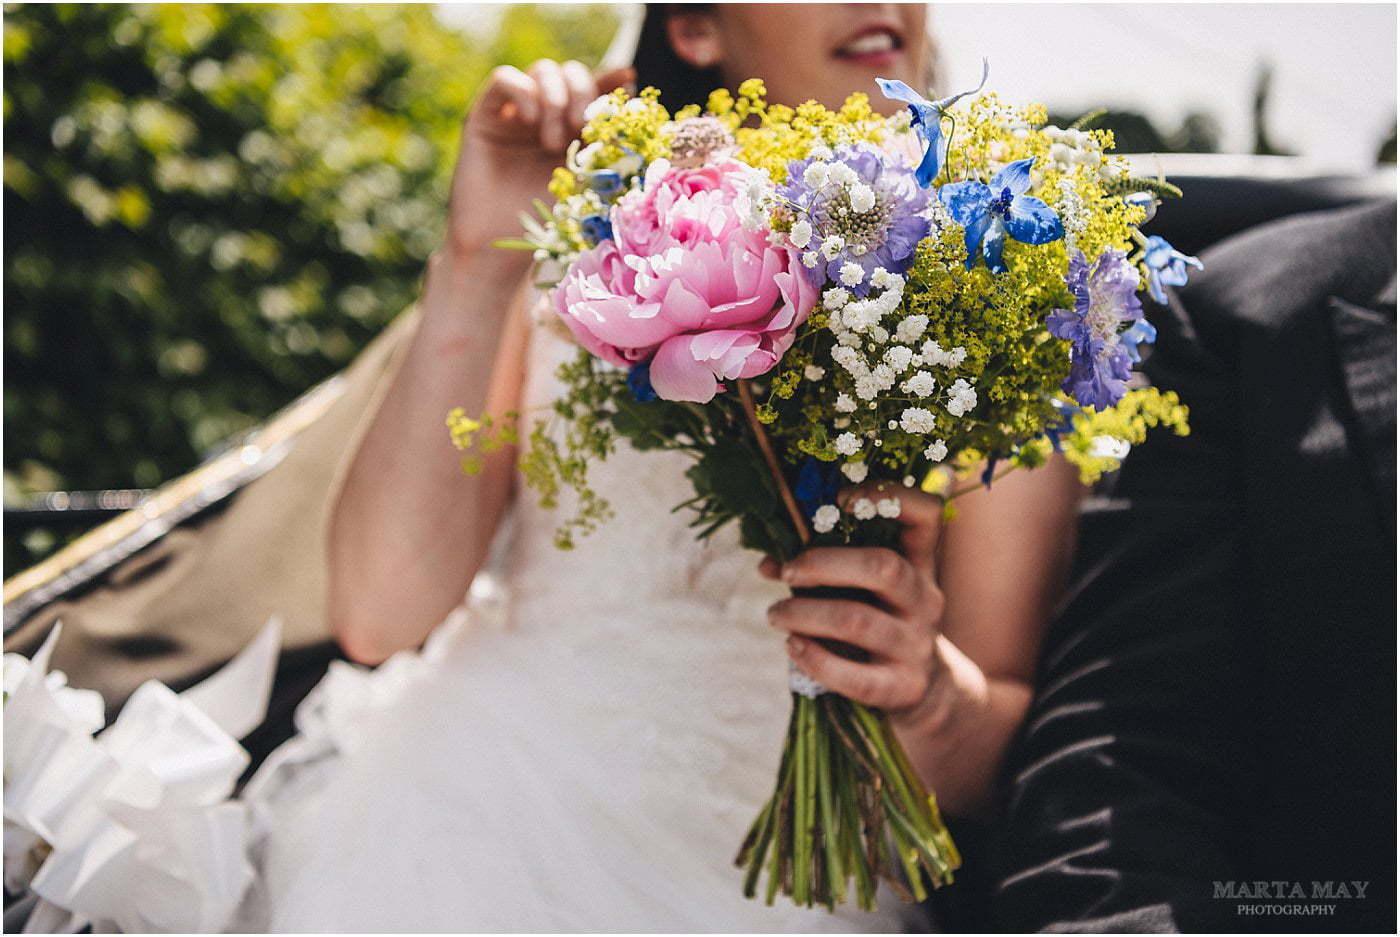 wedding photographer choice Marta May